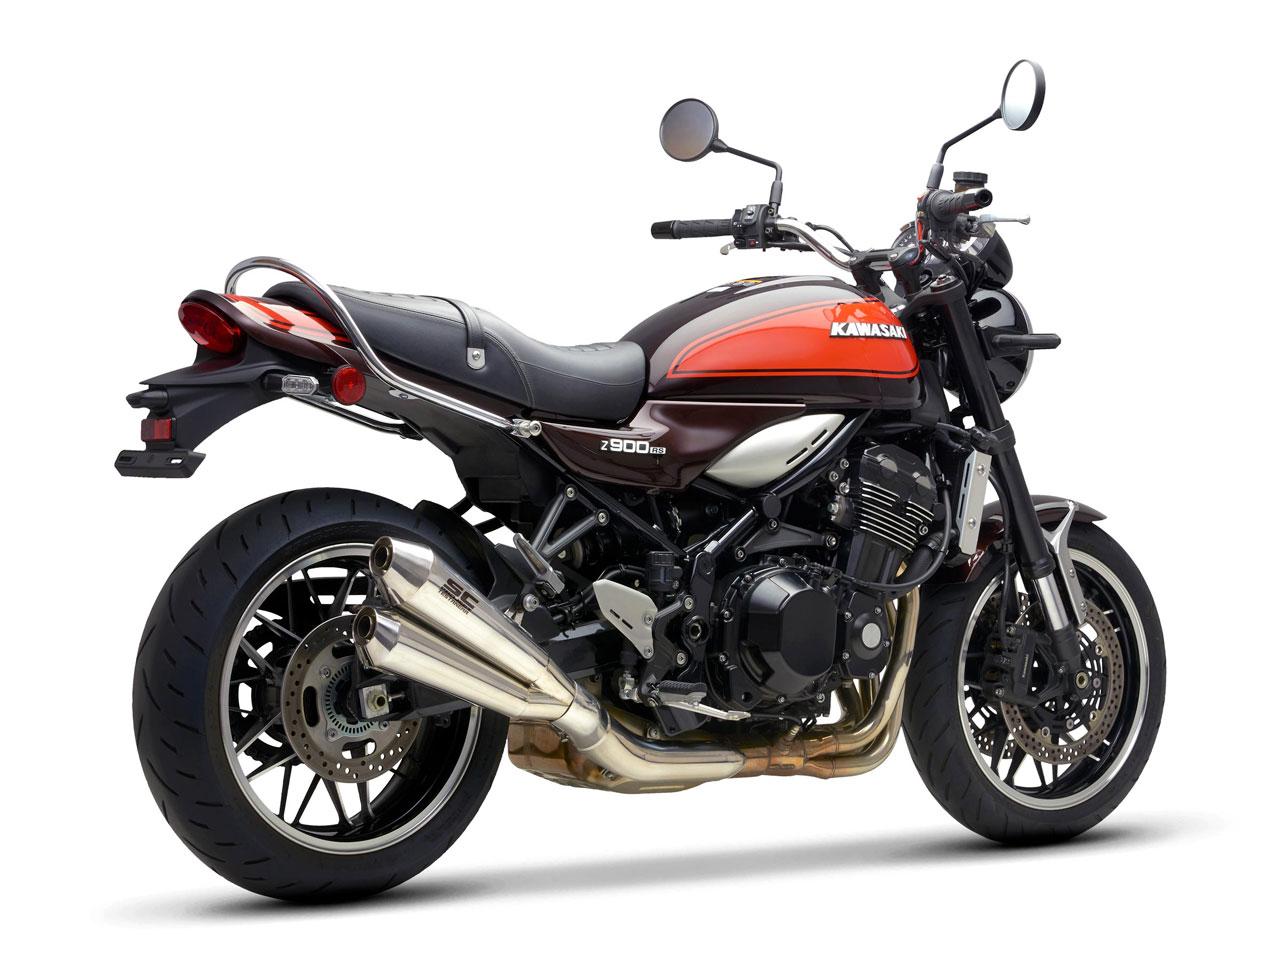 Kawasaki-Z900RS-Testanera_3-4-Posteriore_1280x960px_Web